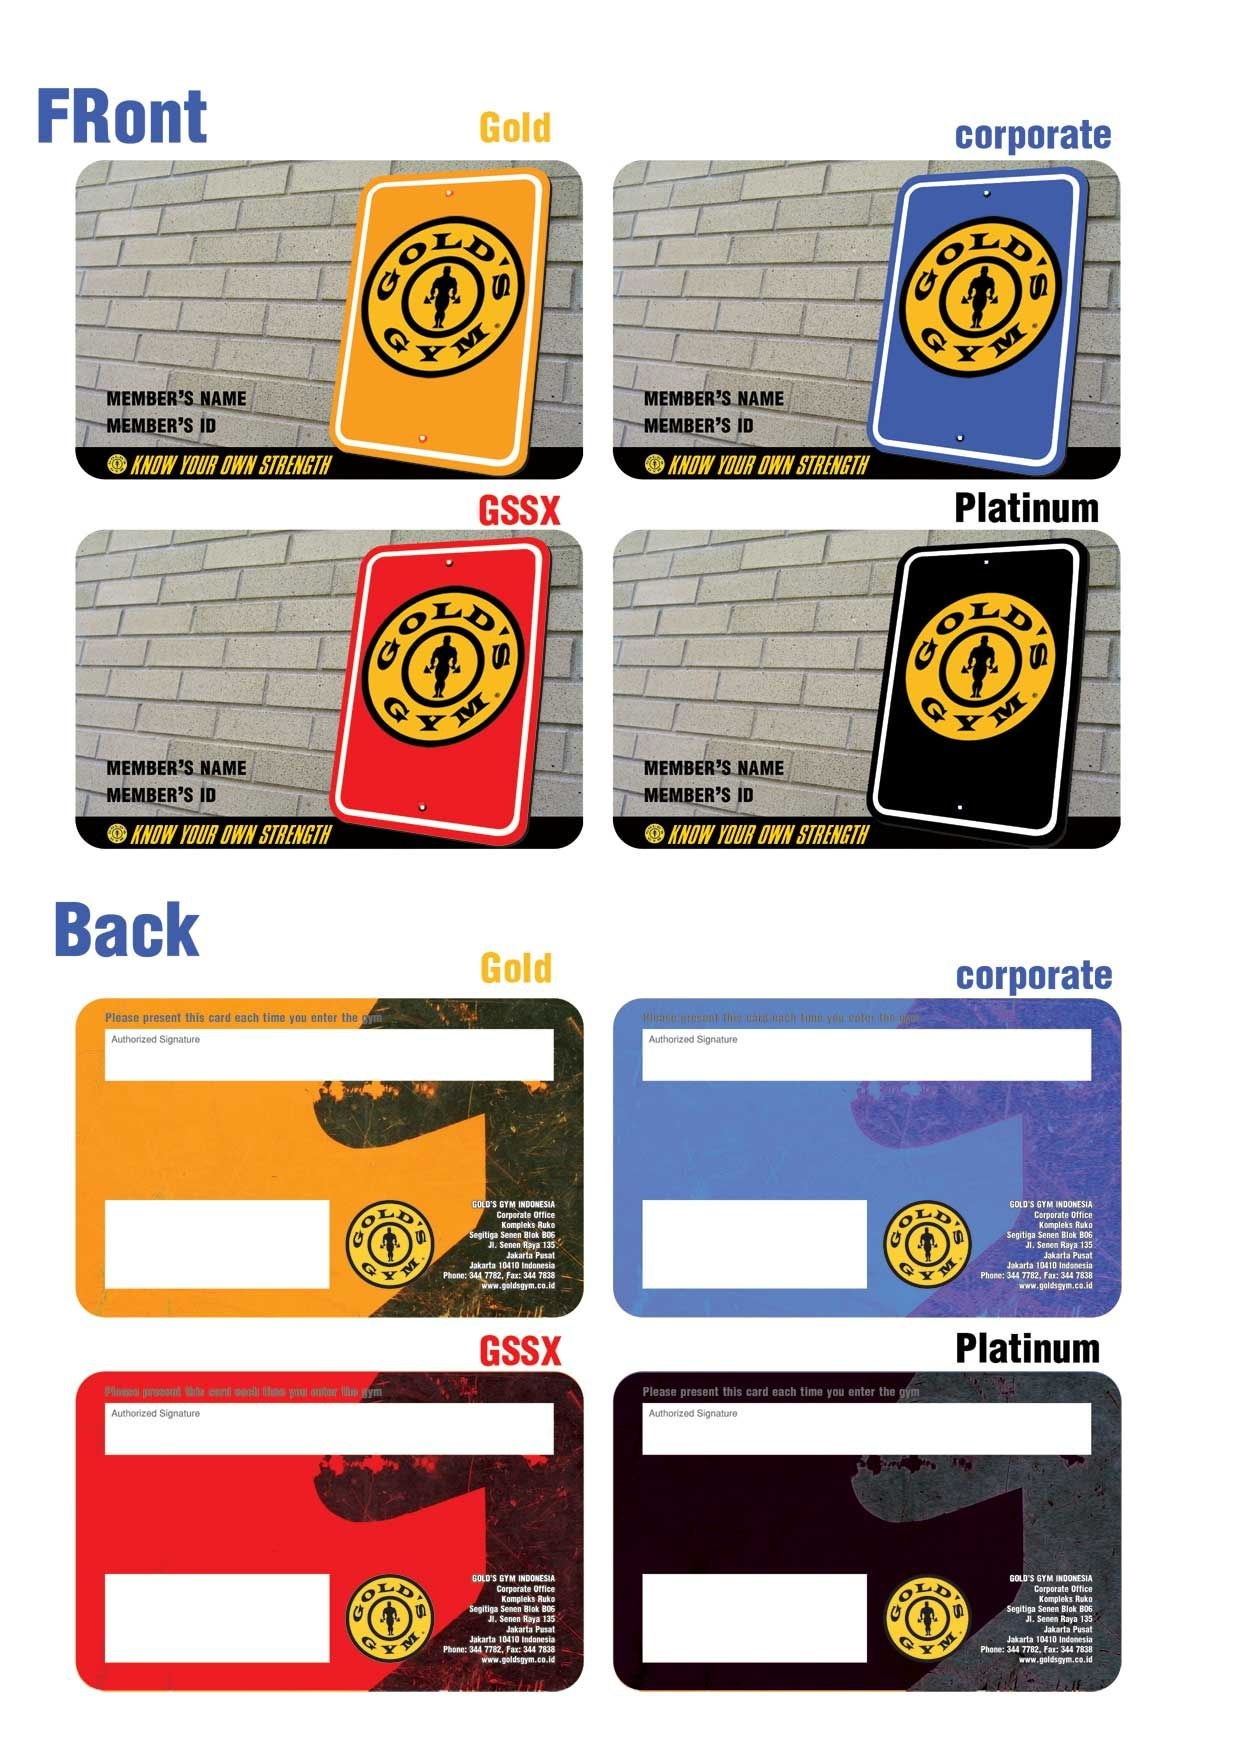 Gold Gym Membership Card  G I F T S  Resume Template Free Golds For Gym Membership Card Template